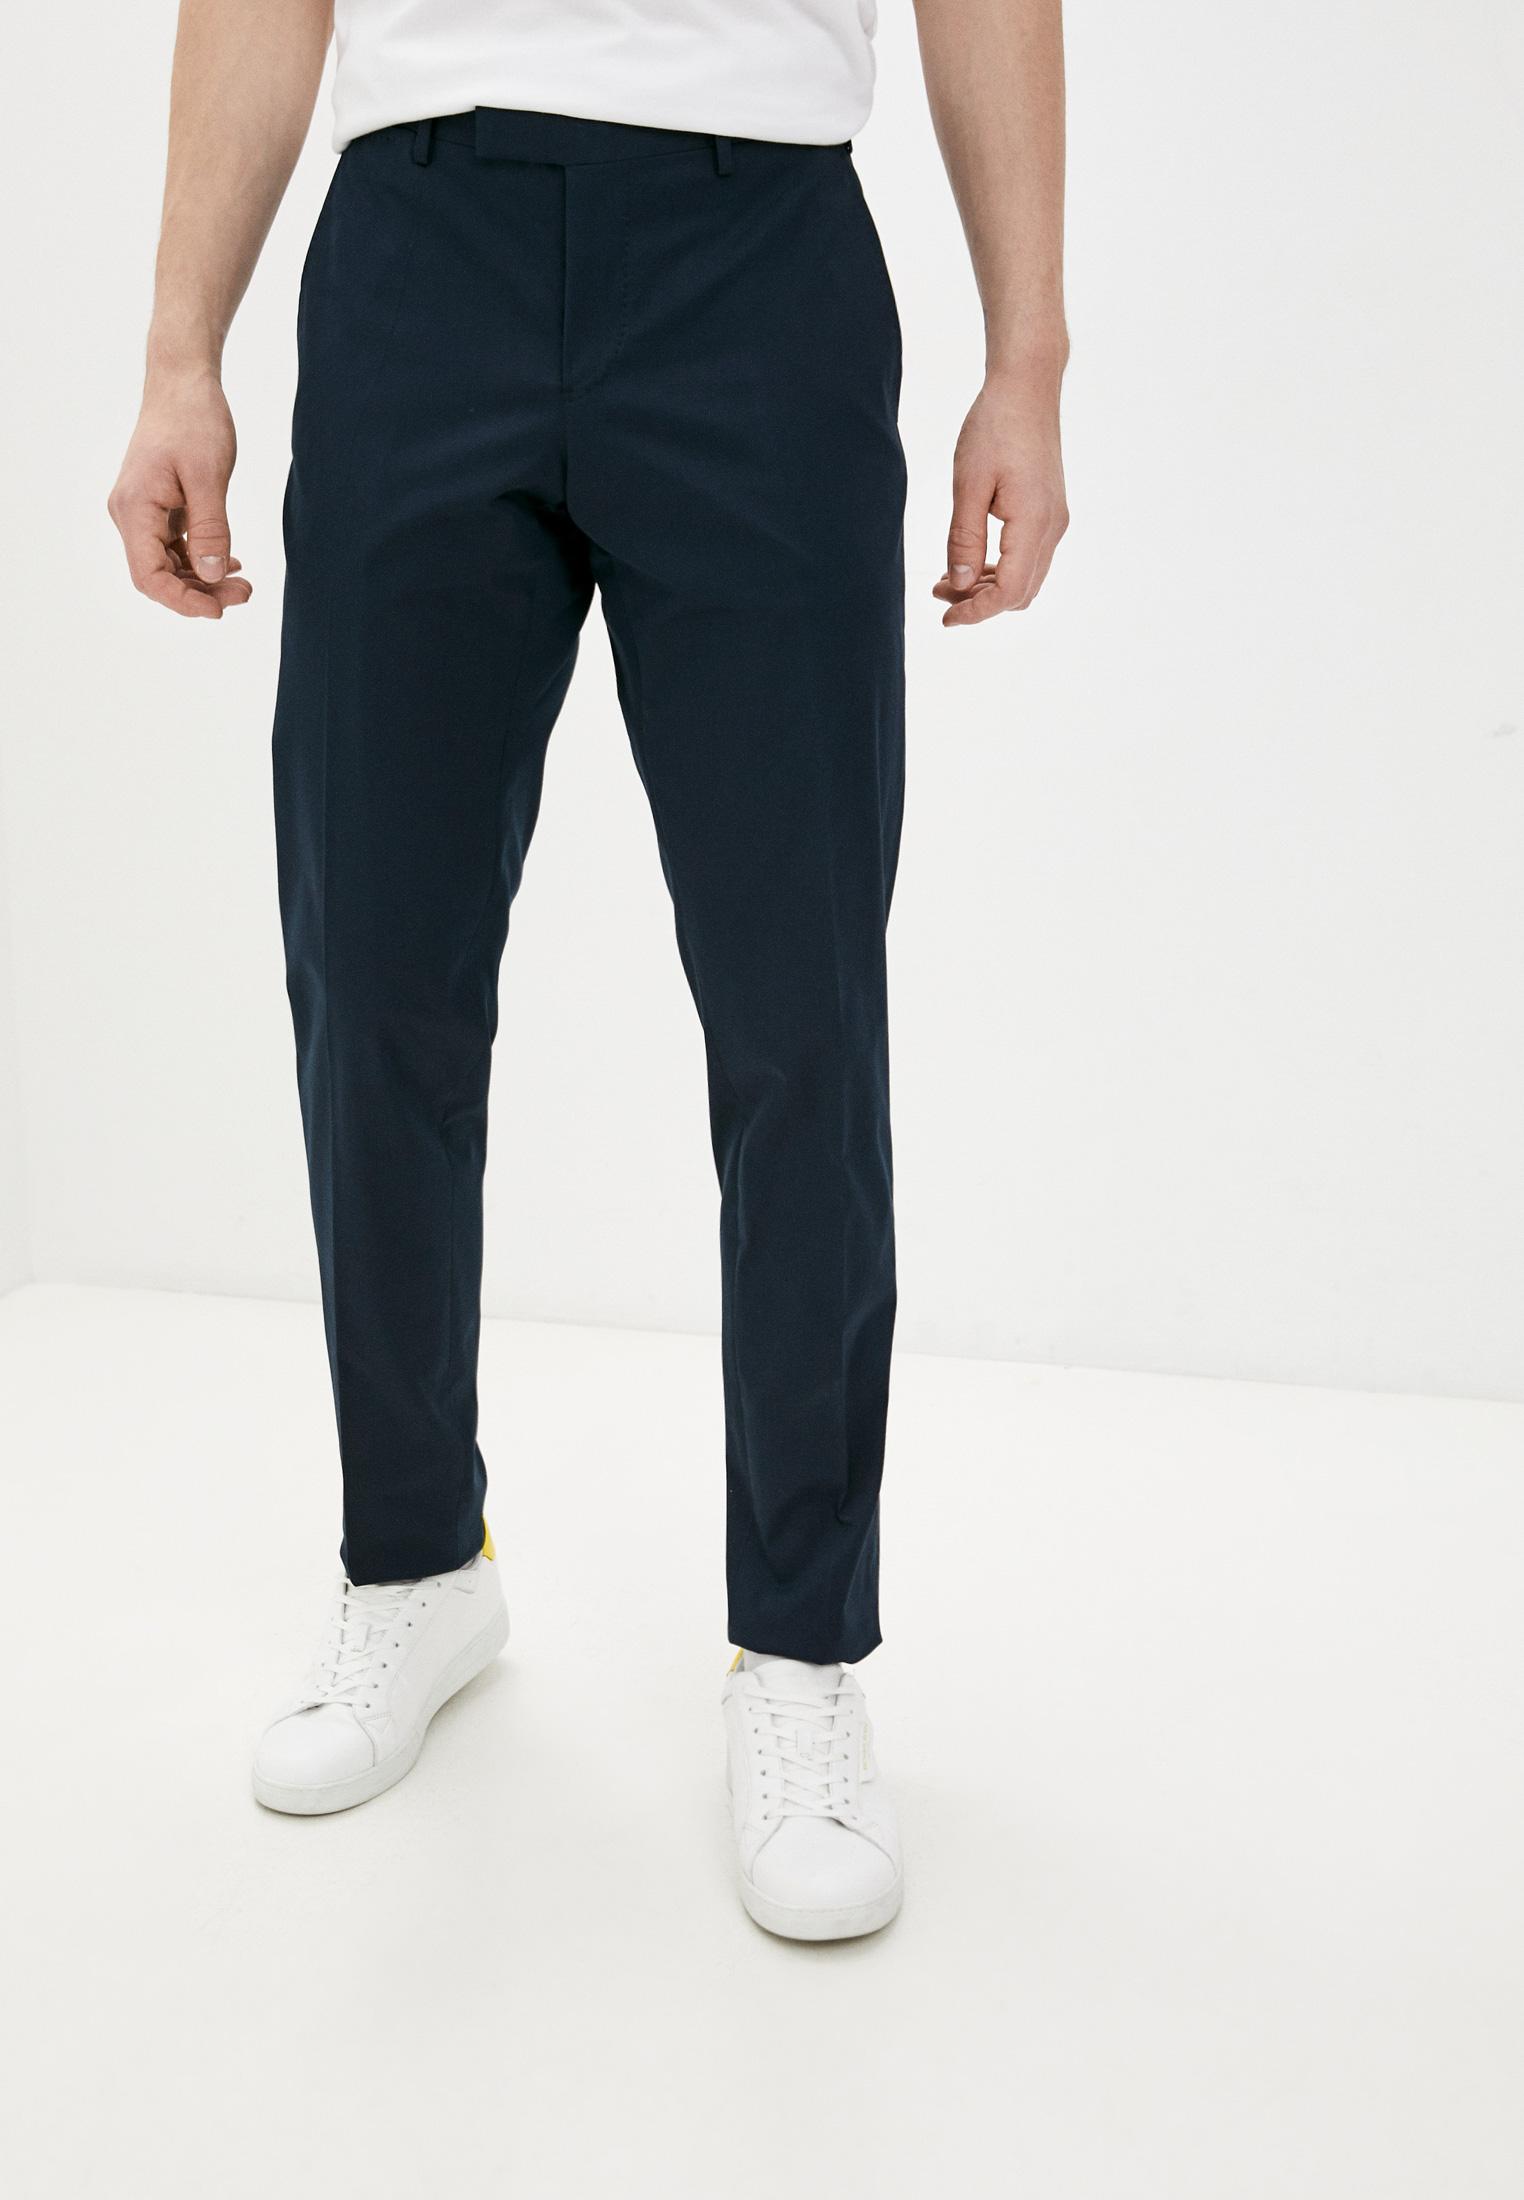 Мужские классические брюки Emporio Armani (Эмпорио Армани) W1P0M0 W1517